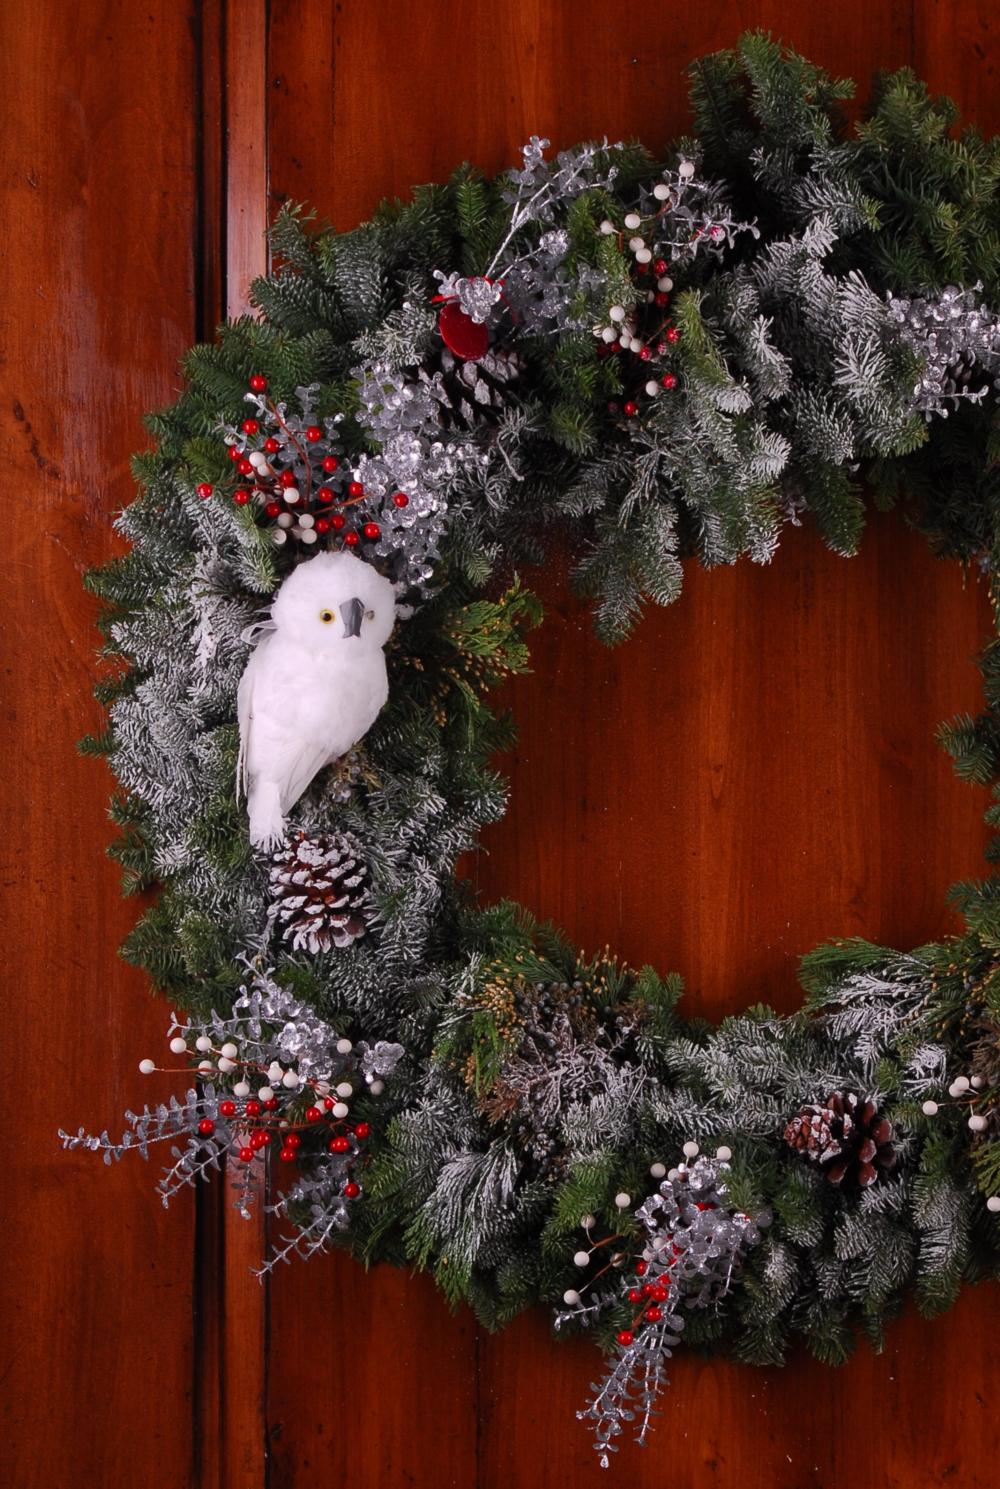 Snowy white owls perched on a fresh green wreath